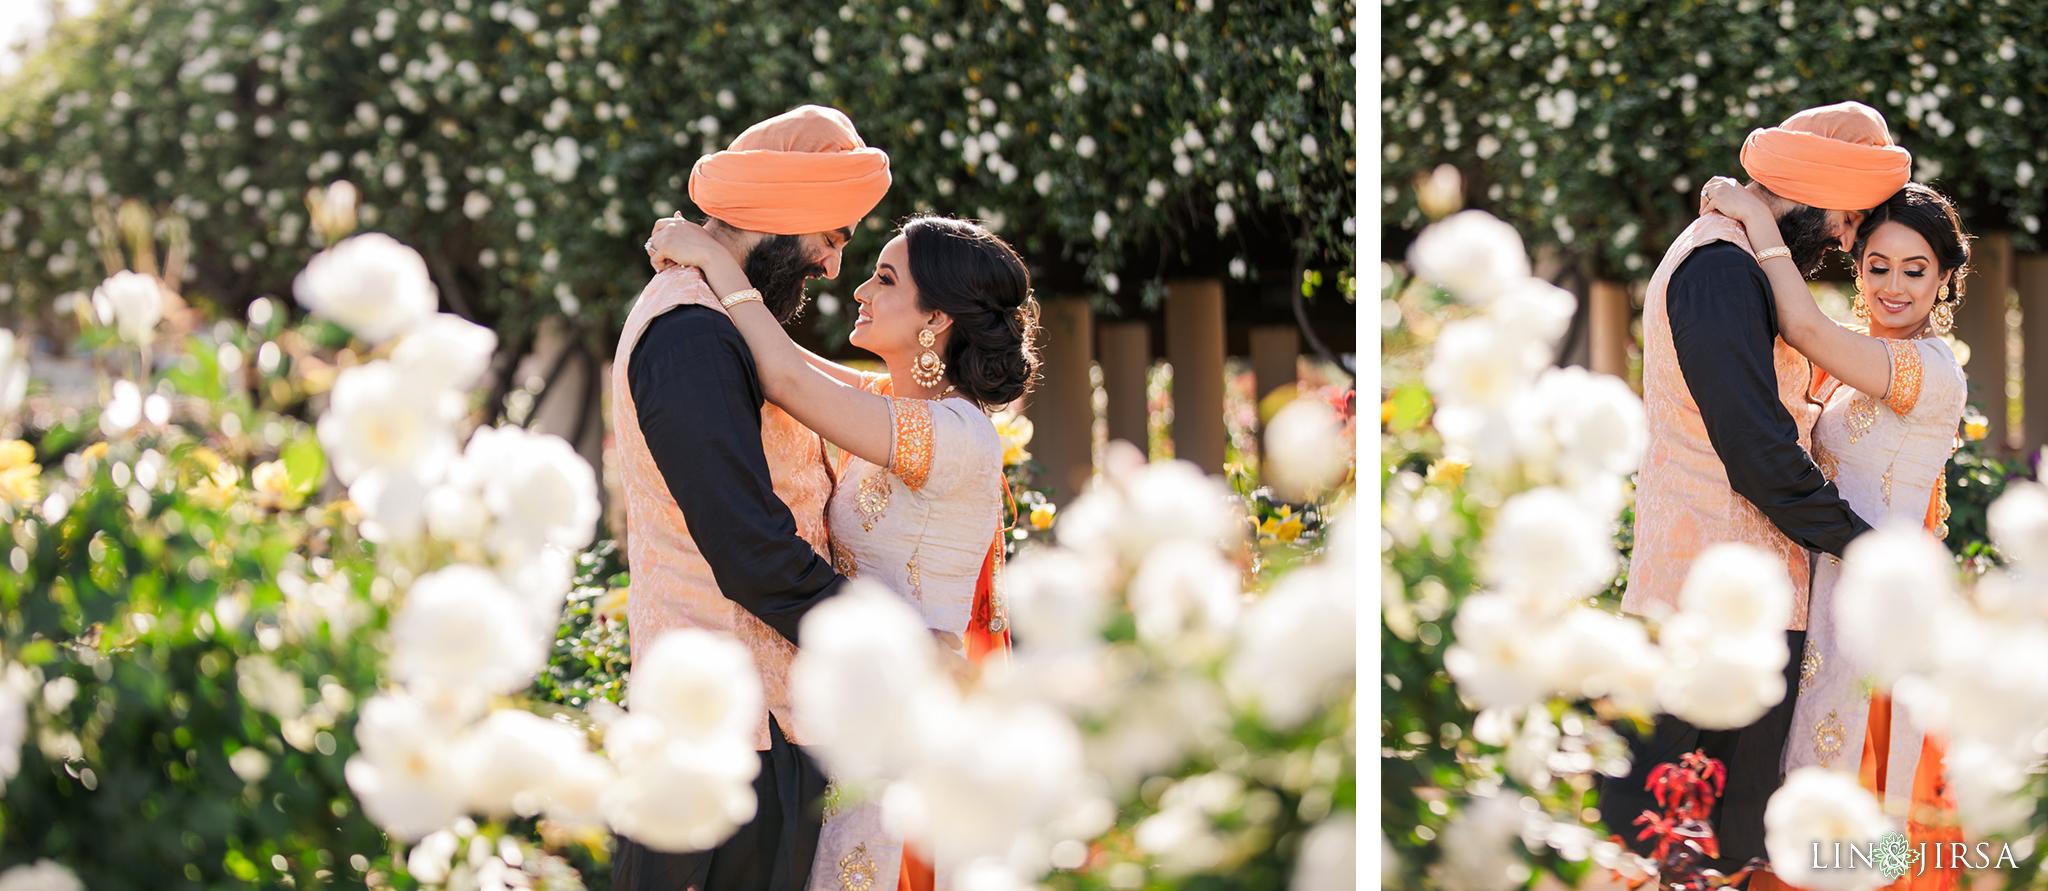 05 Balboa Park San Diego Punjabi Indian Engagement Photography